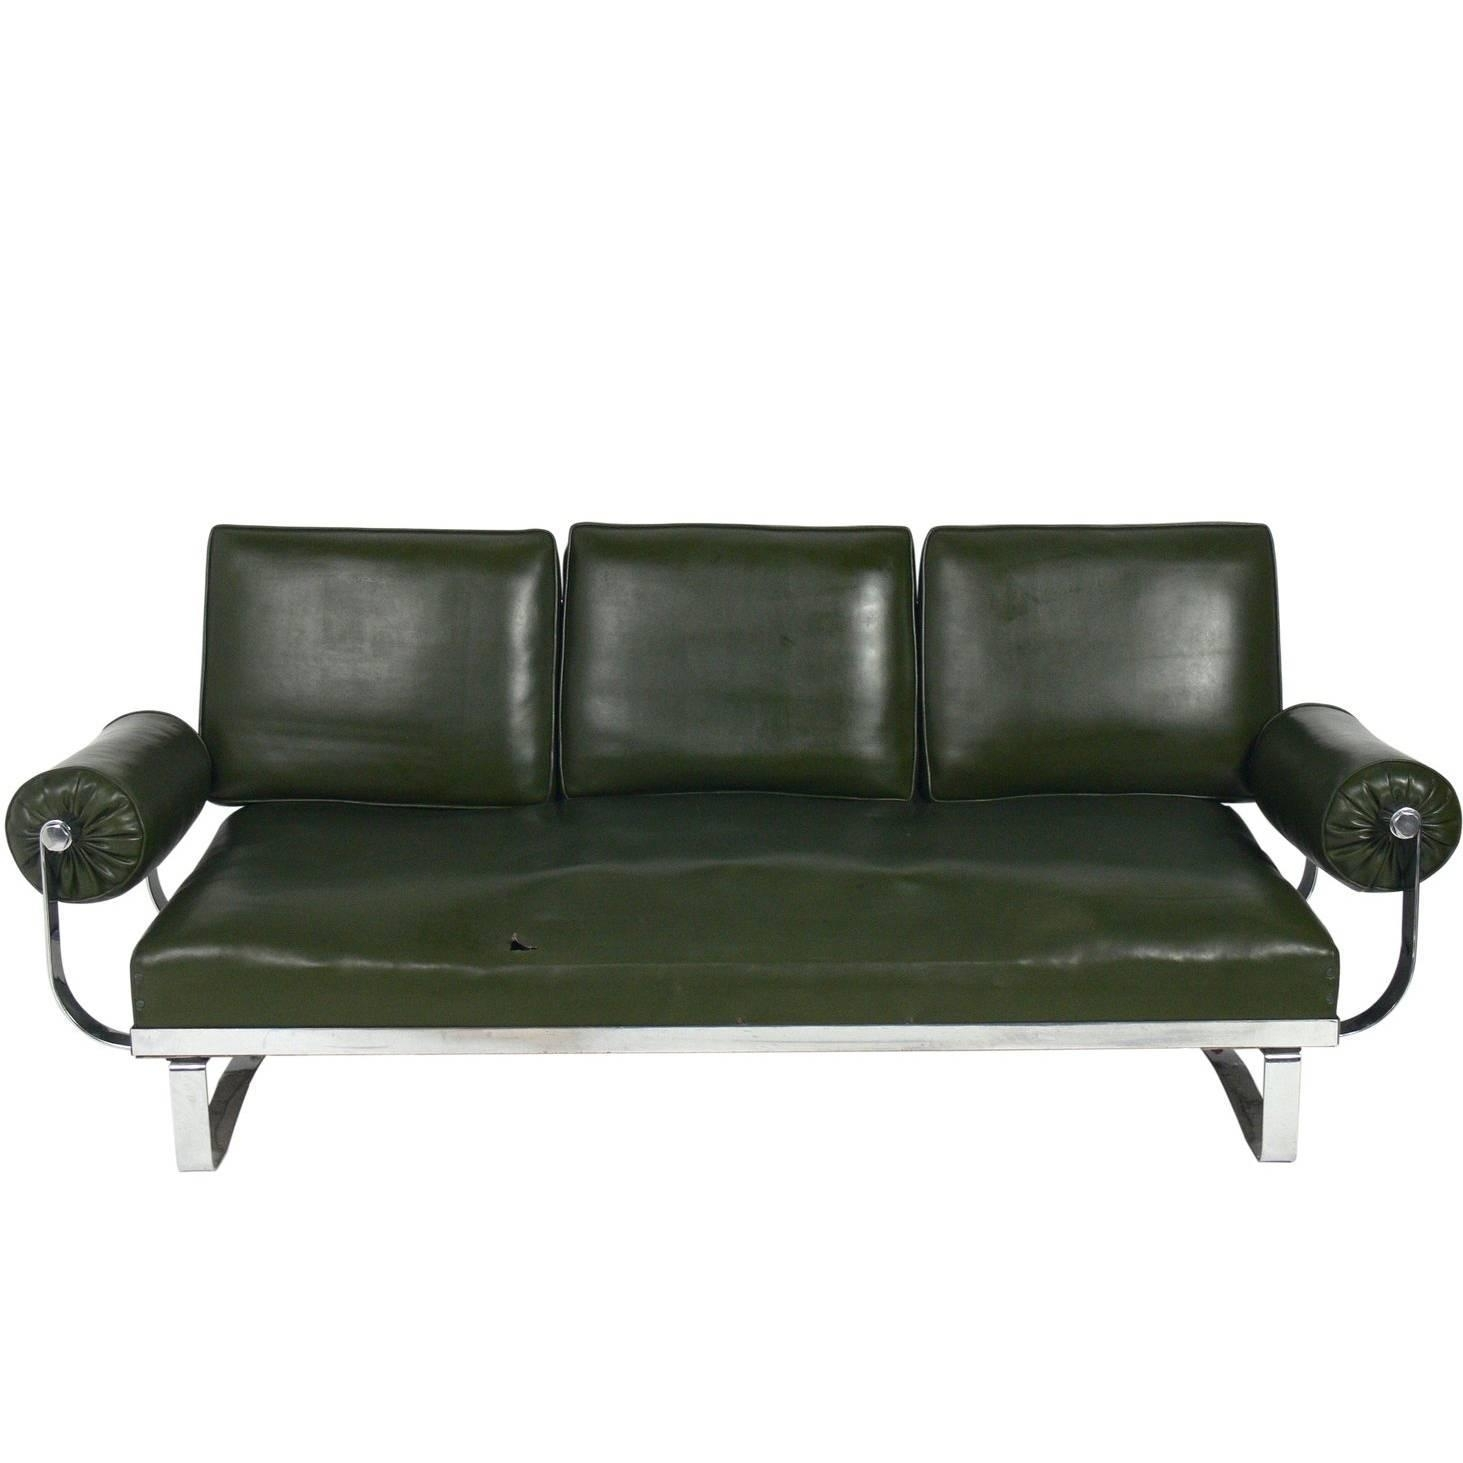 Fancy Art Deco Sofa 43 With Additional Modern Sofa Ideas With Art regarding Art Deco Sofas (Image 6 of 10)